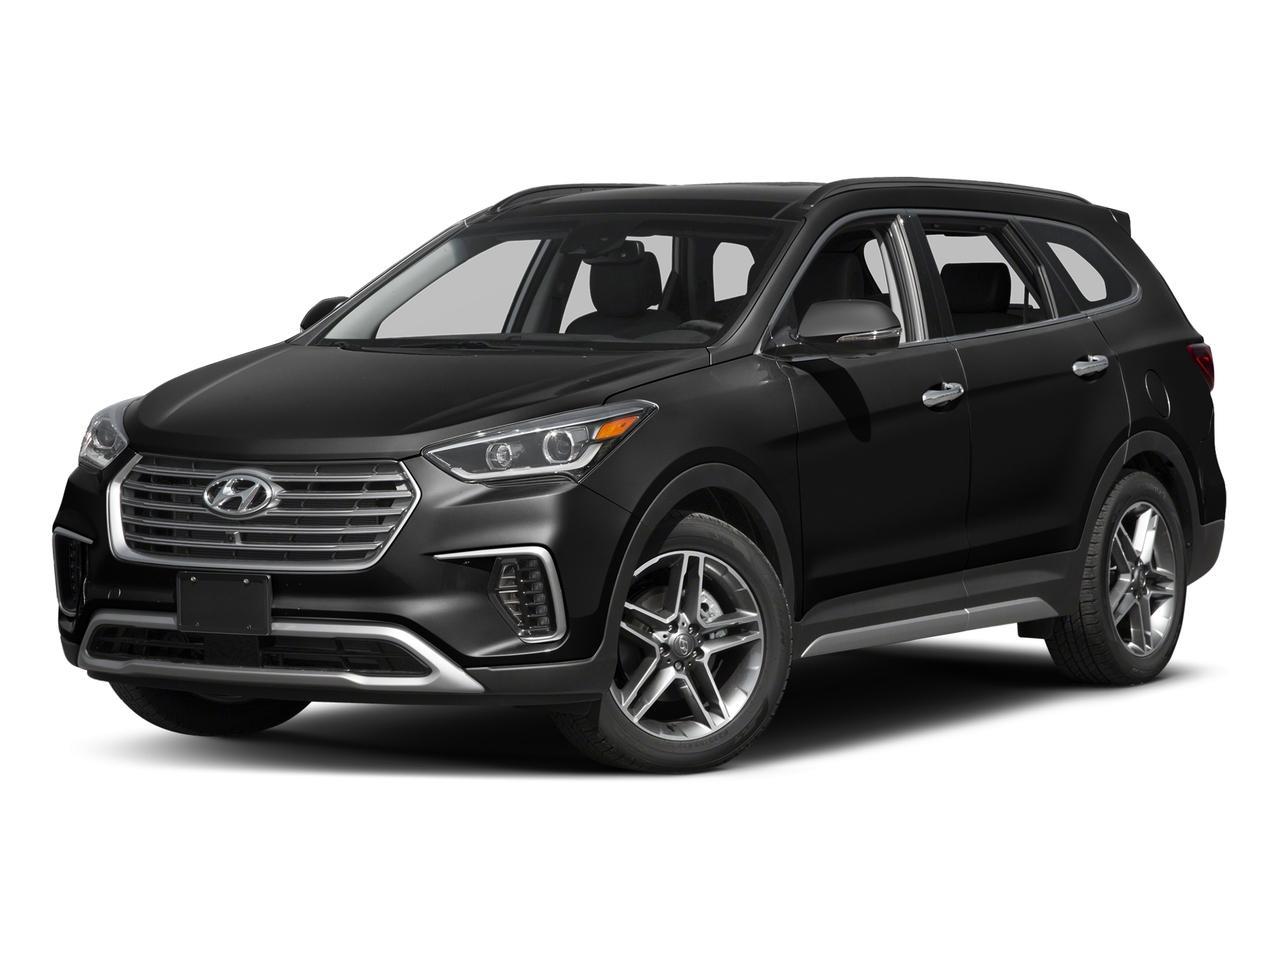 2017 Hyundai Santa Fe Vehicle Photo in Odessa, TX 79762